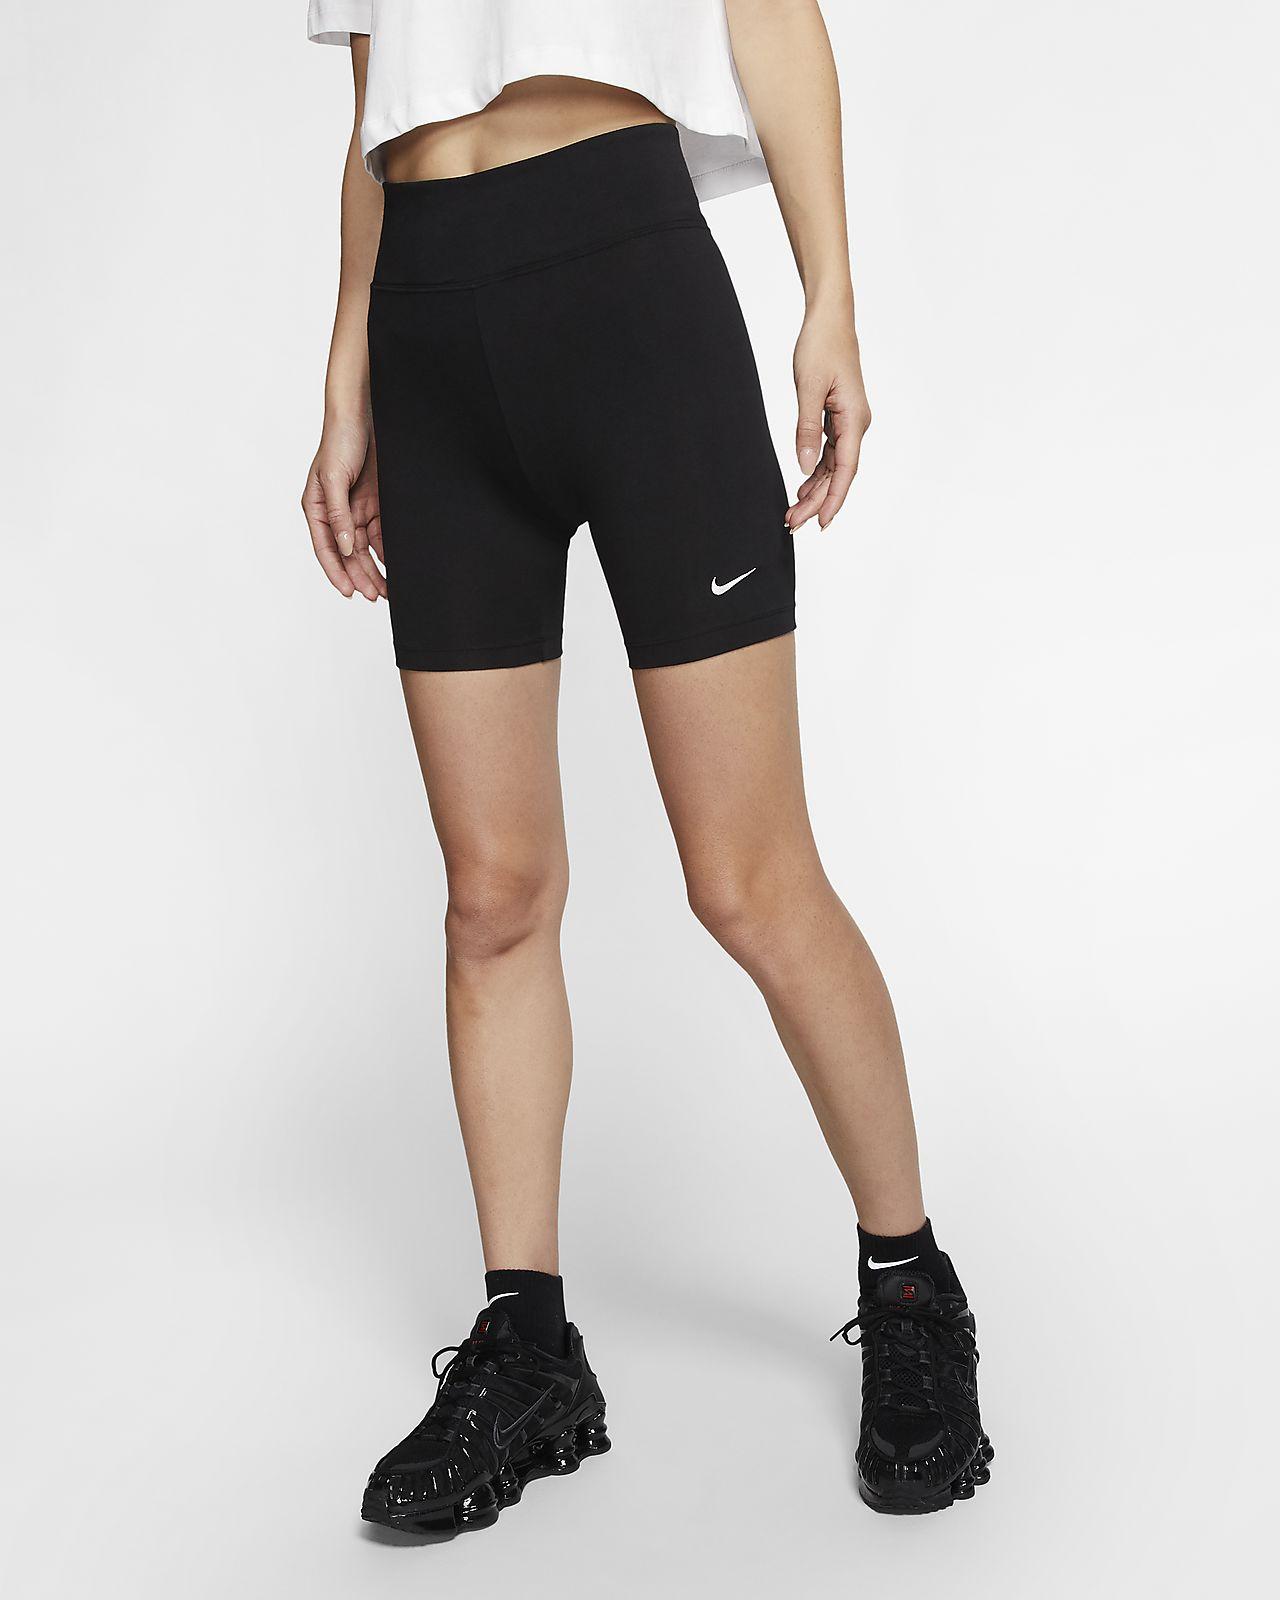 Nike Sportswear Leg-A-See 女子短裤